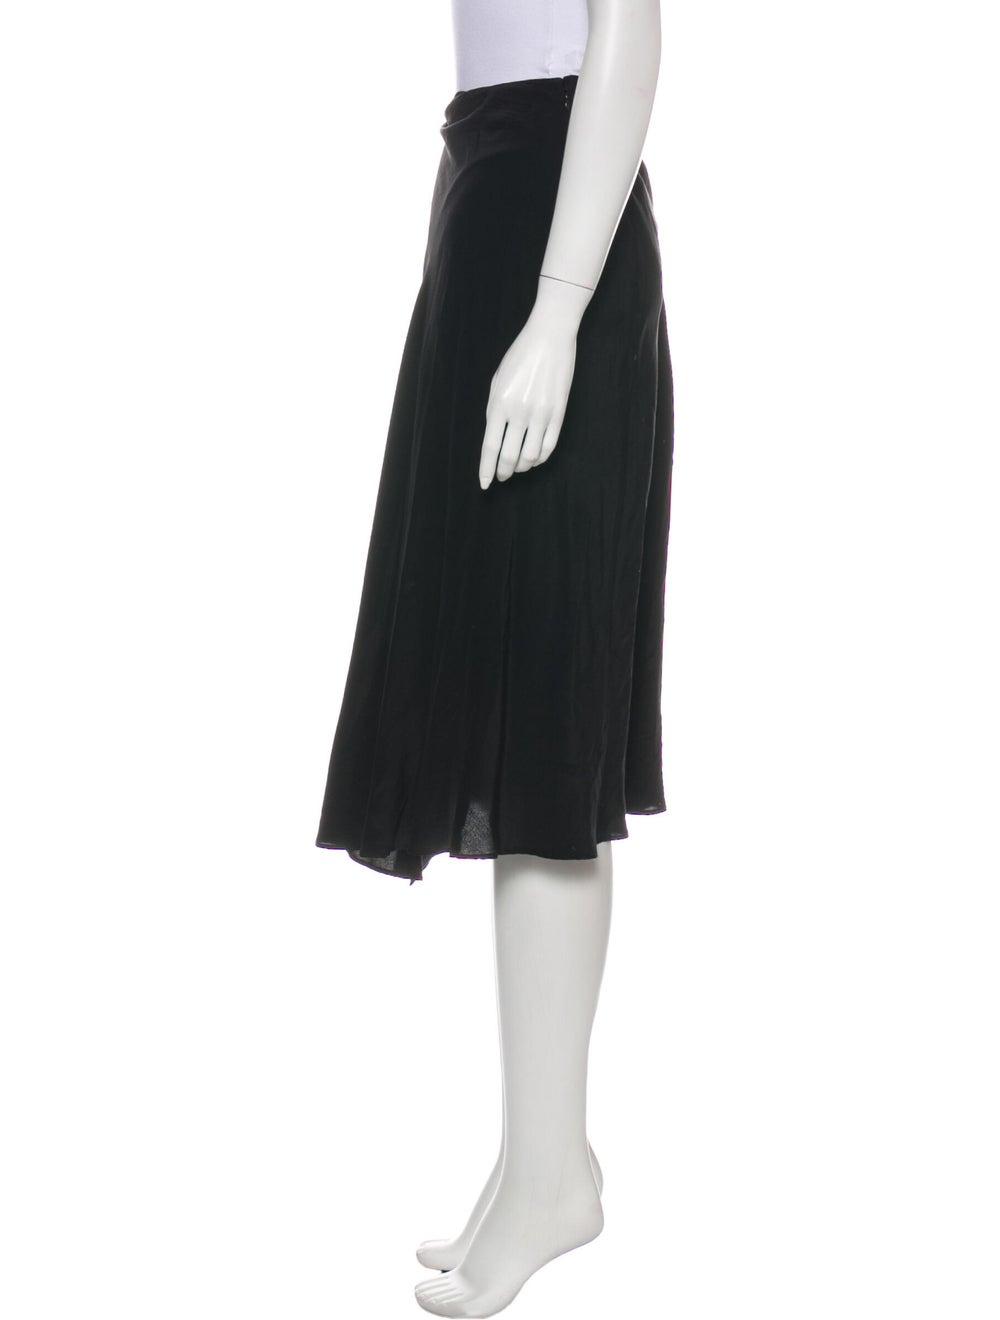 Acne Studios Midi Length Skirt Black - image 2